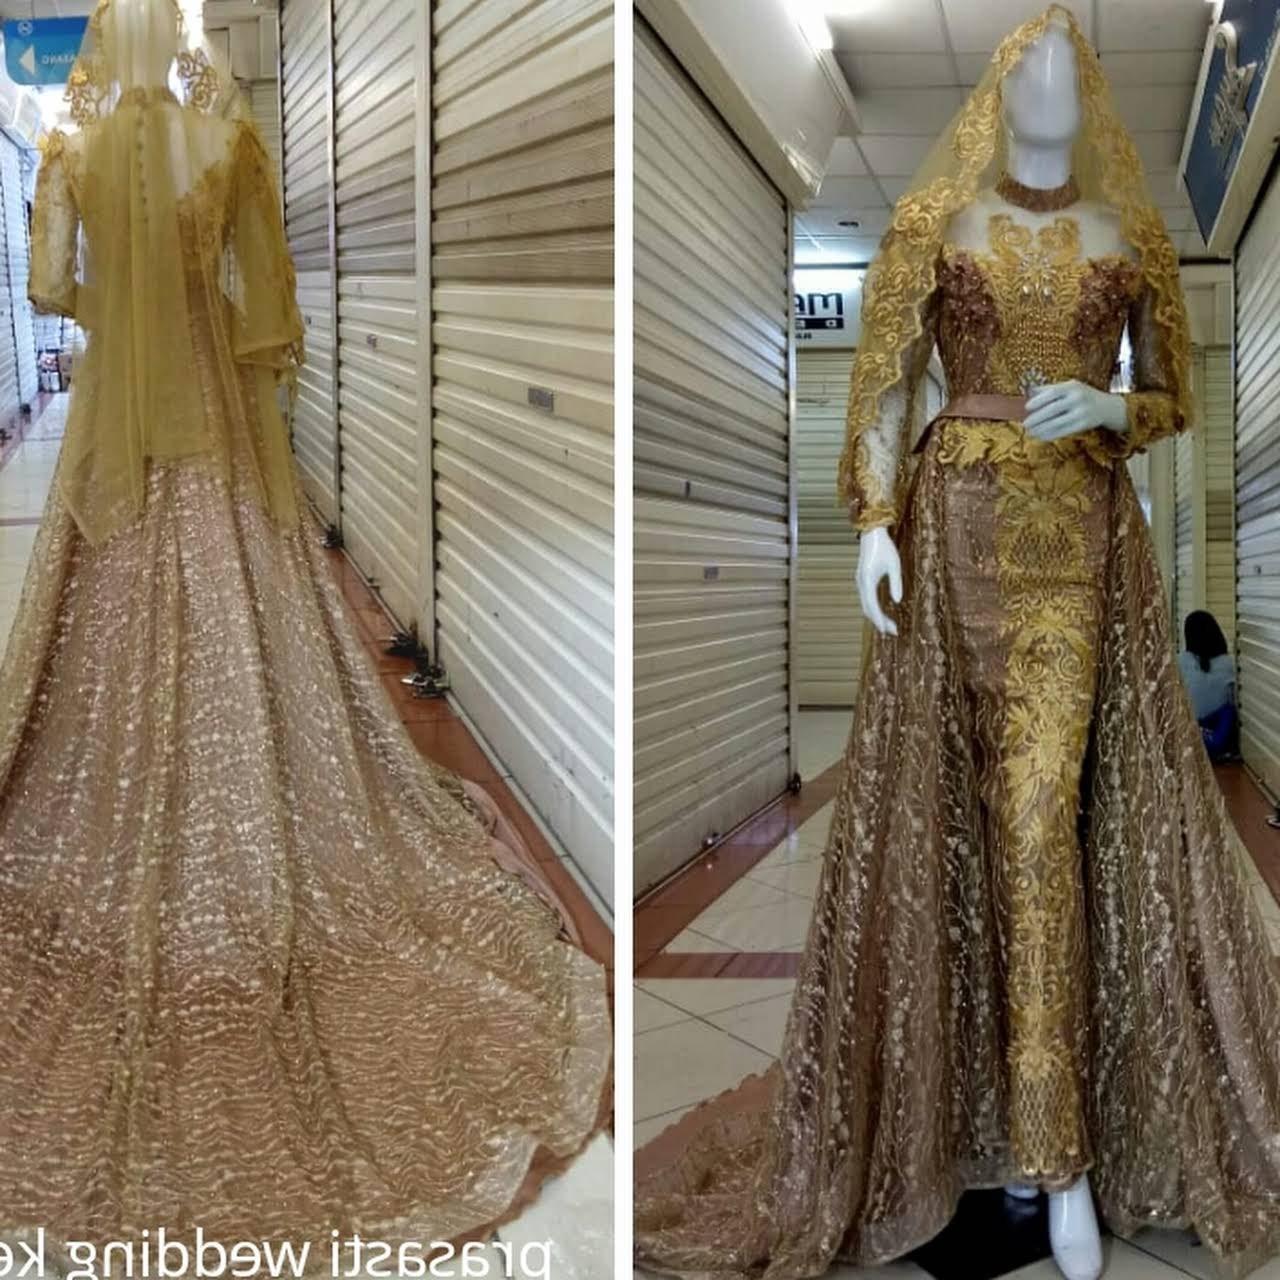 Model Sewa Gaun Pengantin Muslimah Modern Etdg Gaun Kebaya Pengantin Muslimah Hijab Syari Layanan Belanja